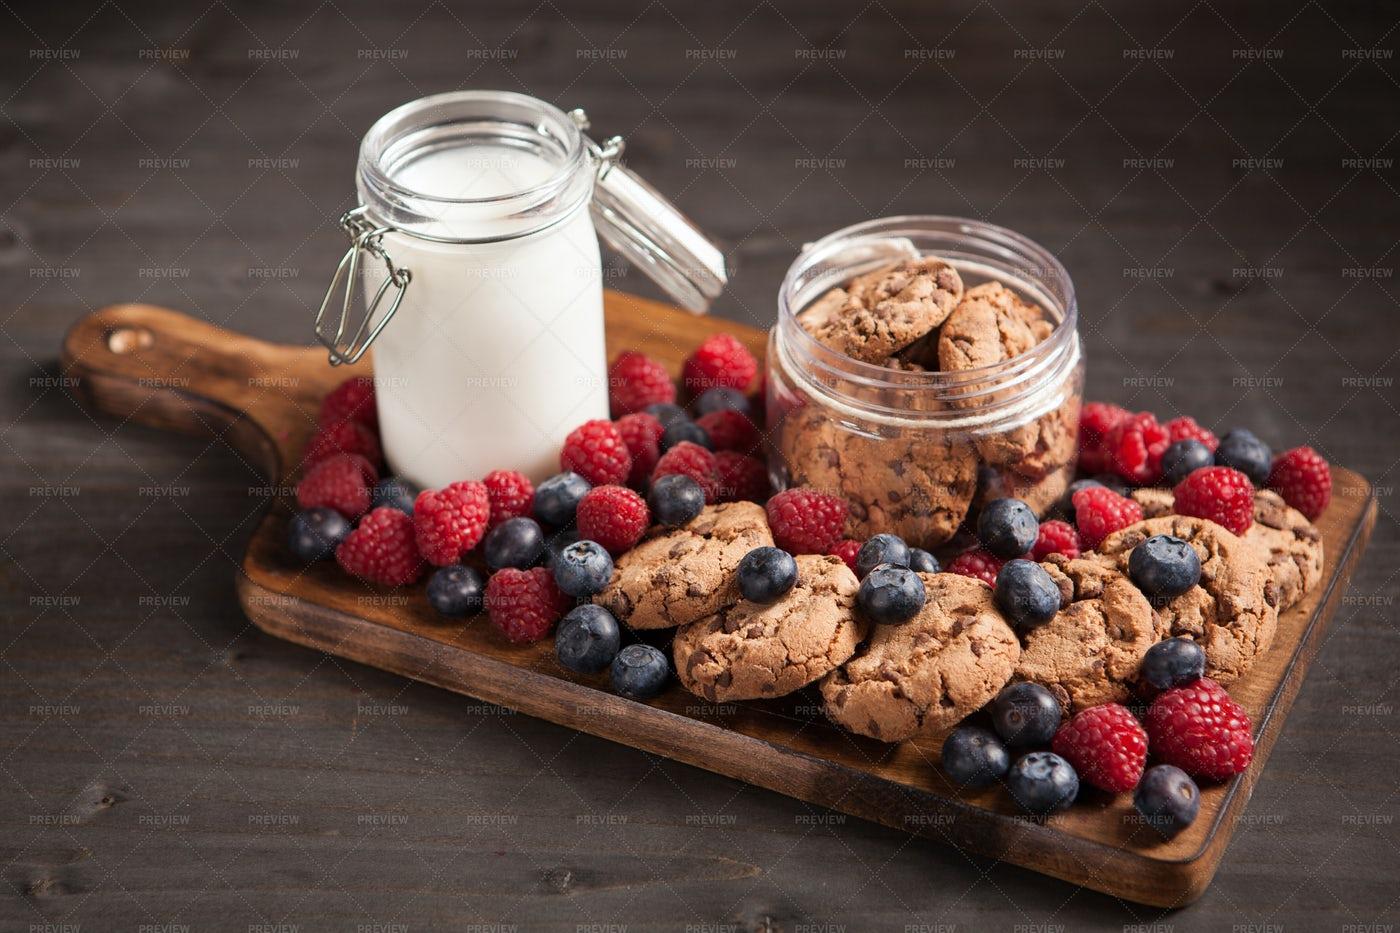 Milk Next To Chocolate Chip Cookies: Stock Photos